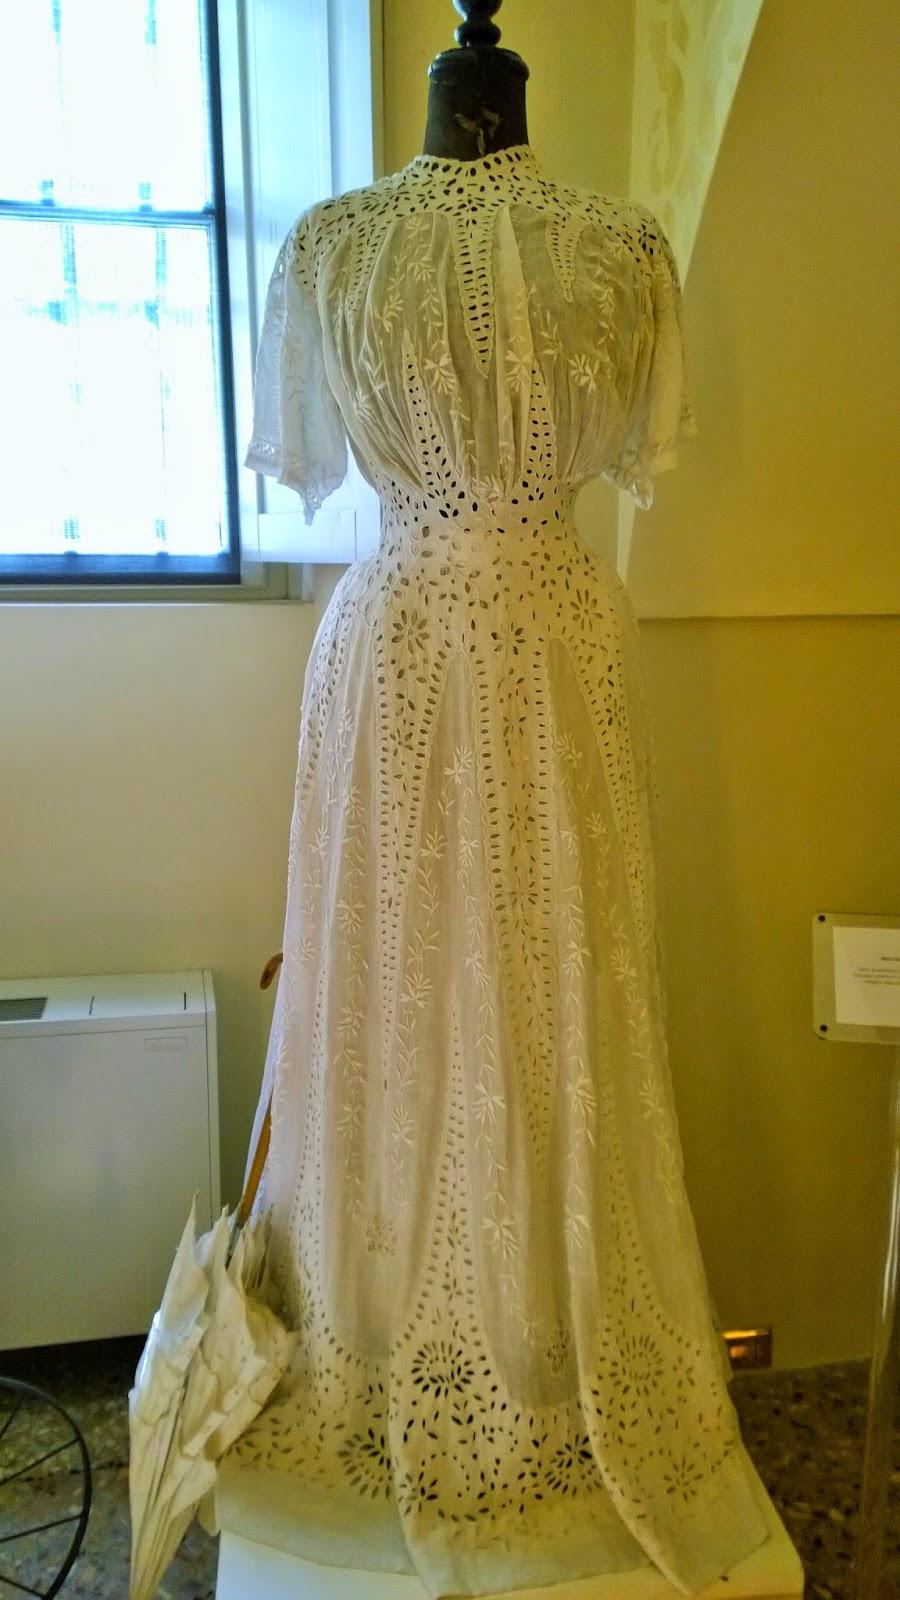 Wedding dress - 1870-1880